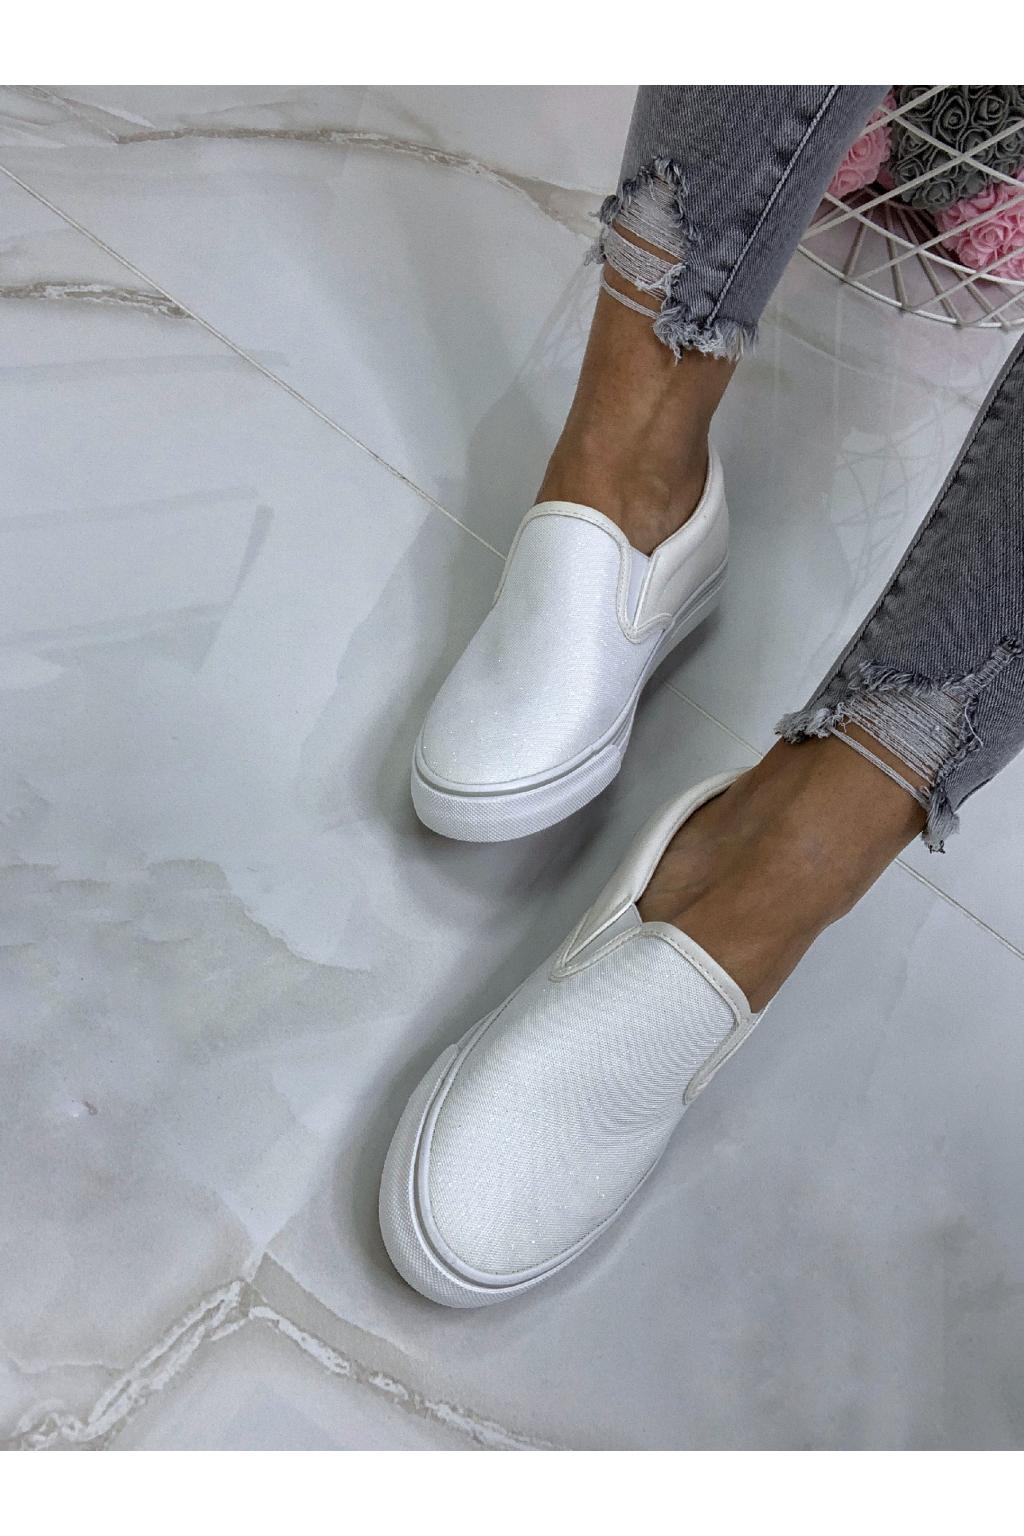 SLIP ON CLASSIC WHITE